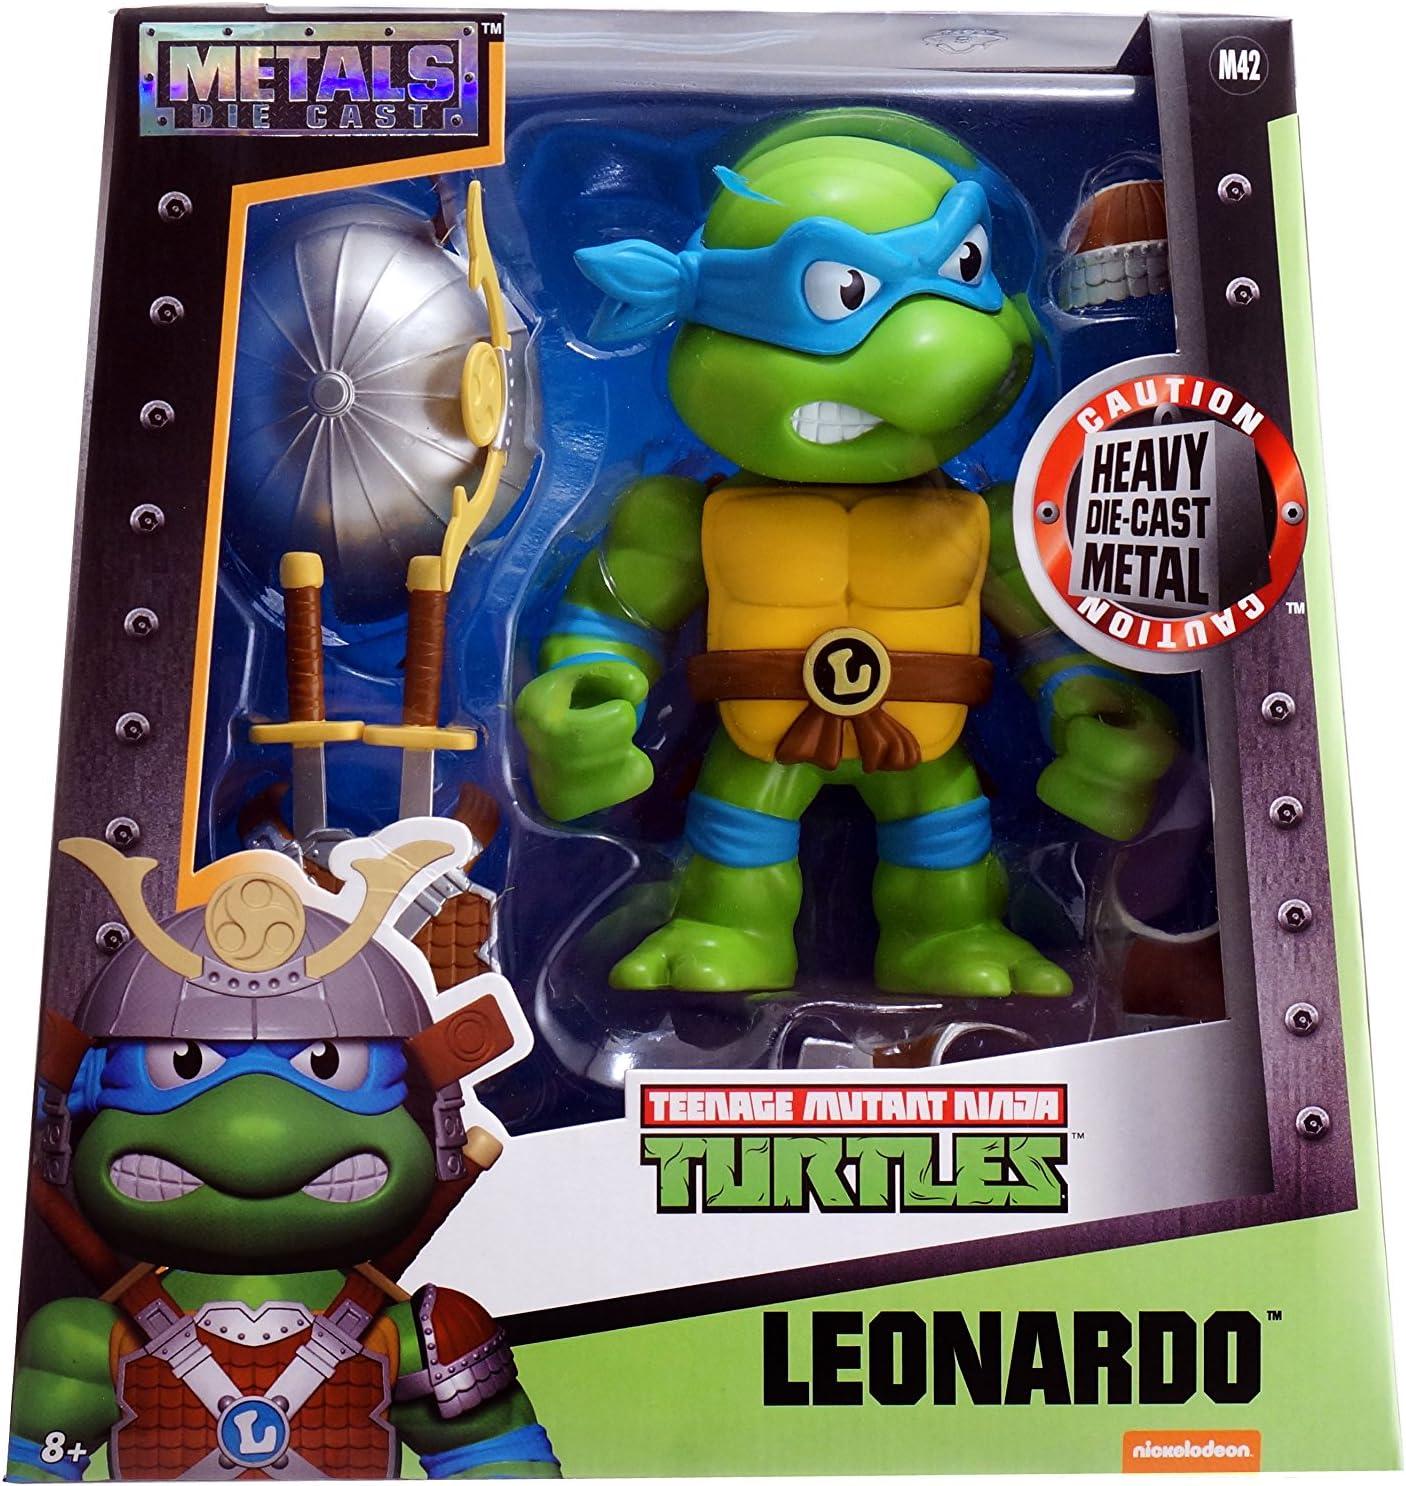 Metals TMNT 6 inch Classic Figure - Leonardo w/ Armor (M42)